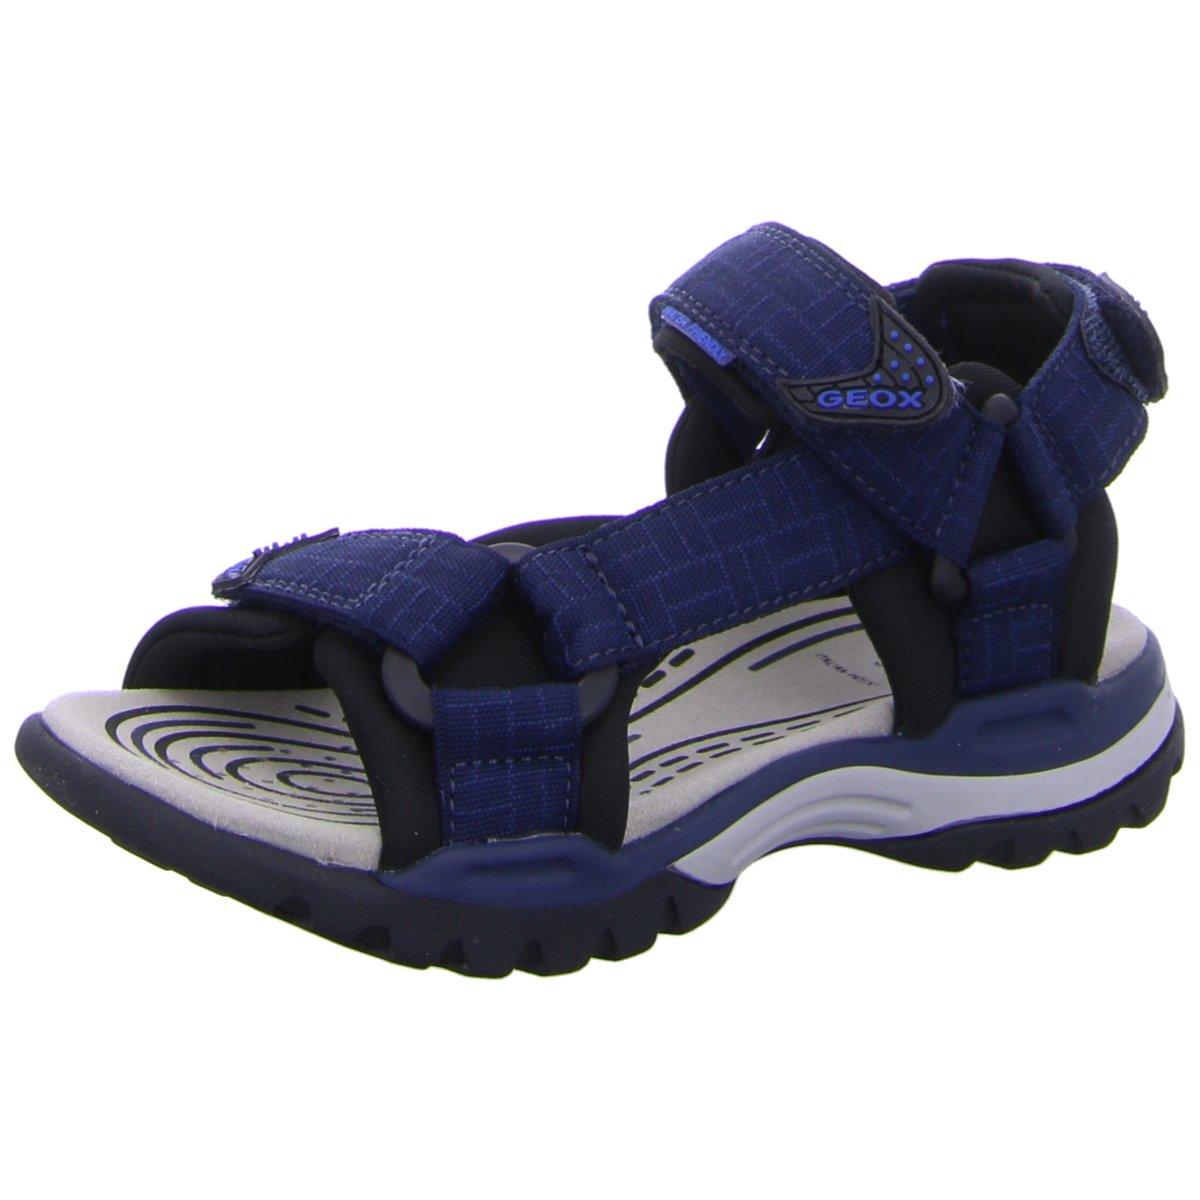 brand new b005b da557 Details zu Geox Kinder Schuhe 7502-33042-AAM1 J620RD-00011/C4367 blau 96233